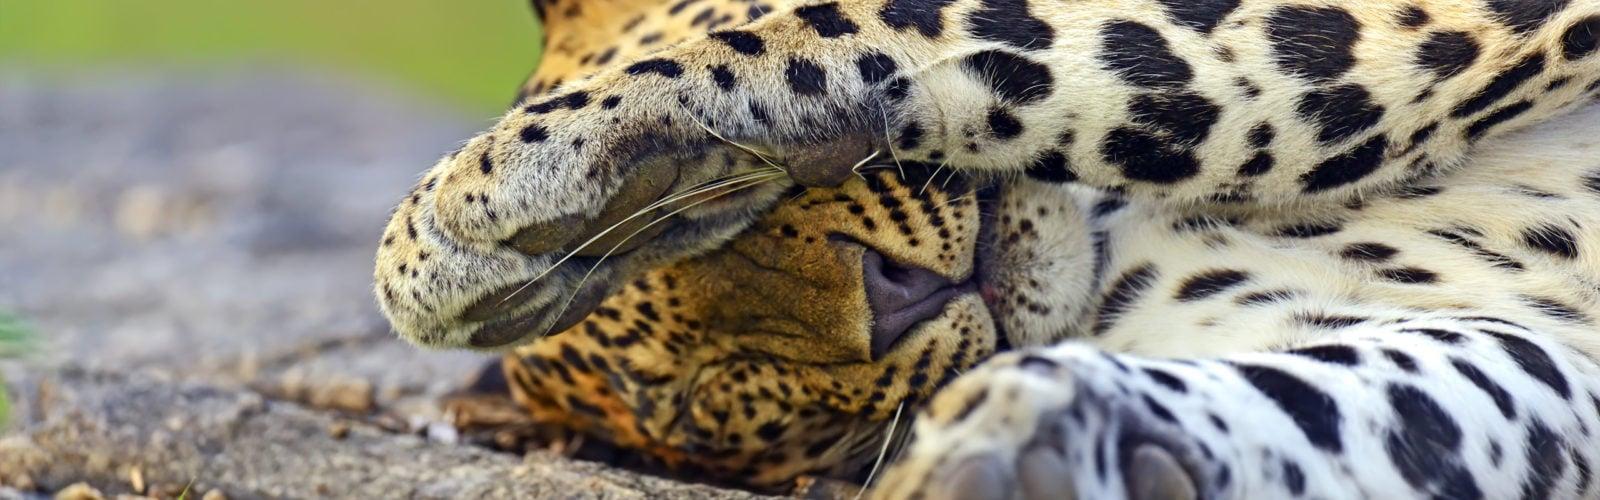 leopard-yala-national-park-sri-lanka